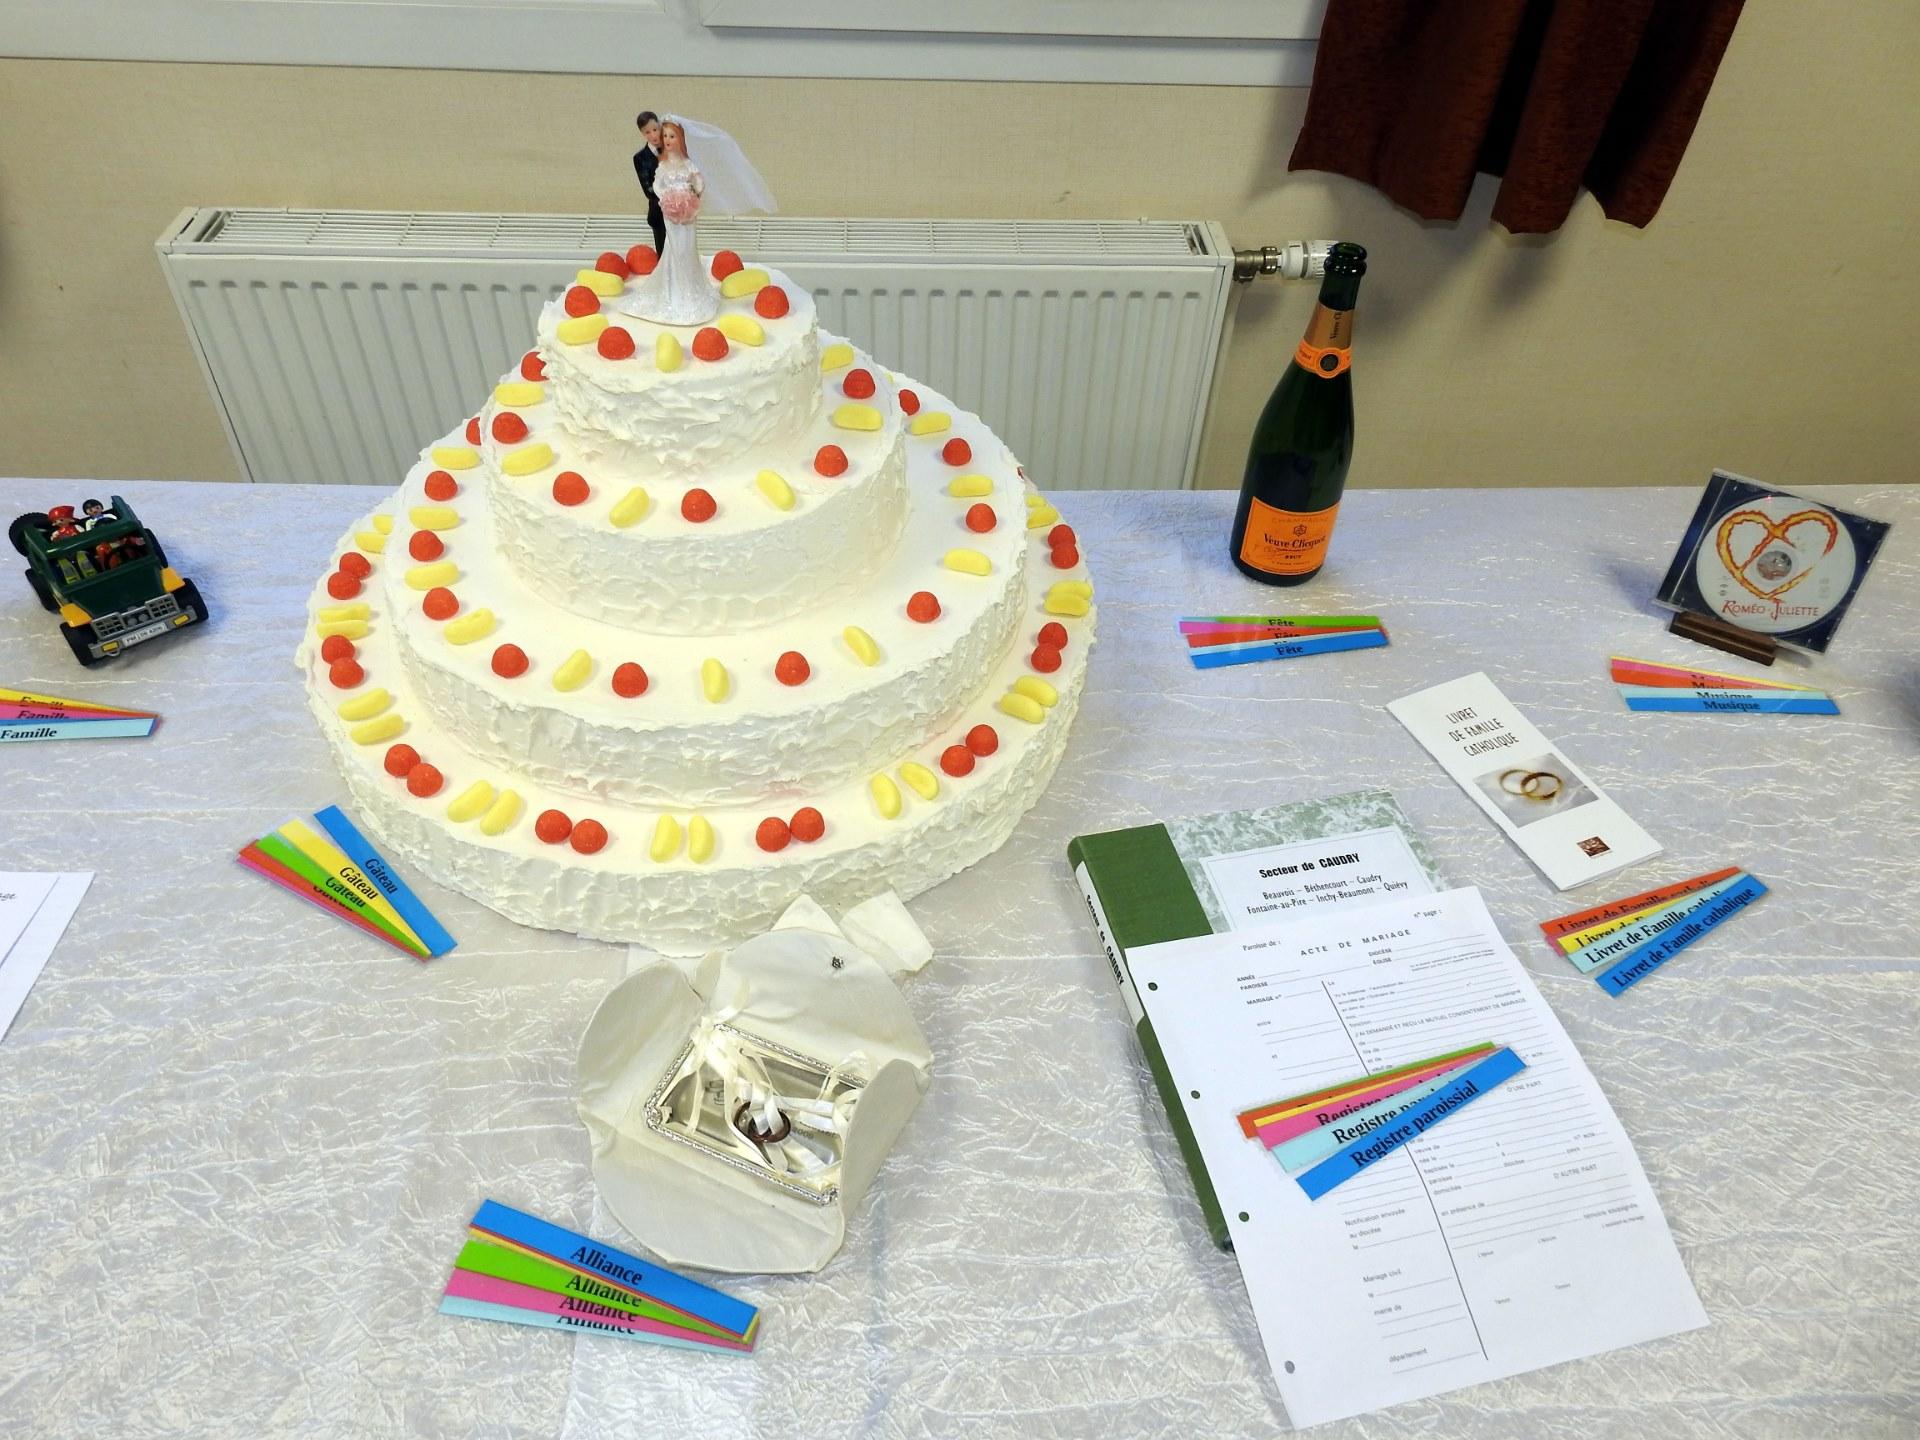 2018_03_16-02-Caudry (59)-Preparation au mariage